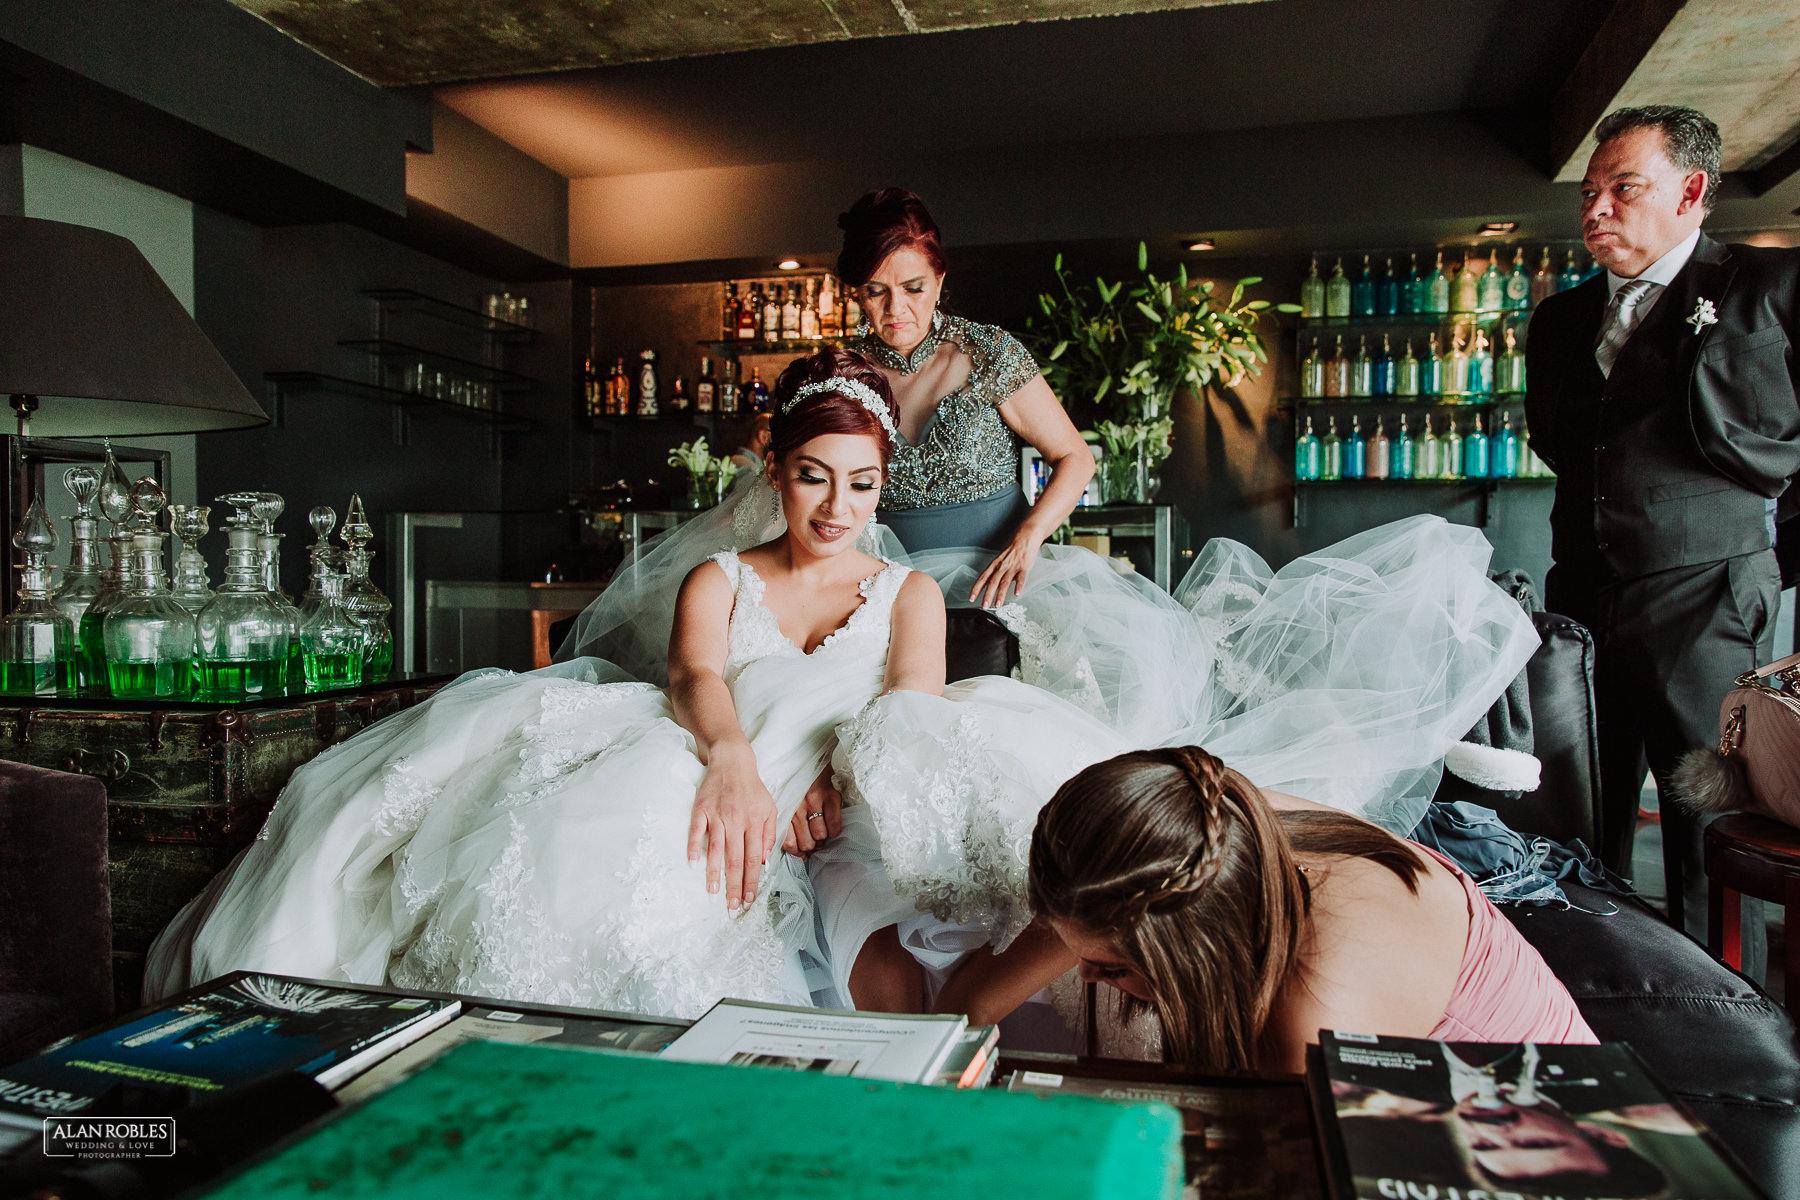 Alan Robles fotografo de bodas guadalajara - LyP Hotel Demetria-42